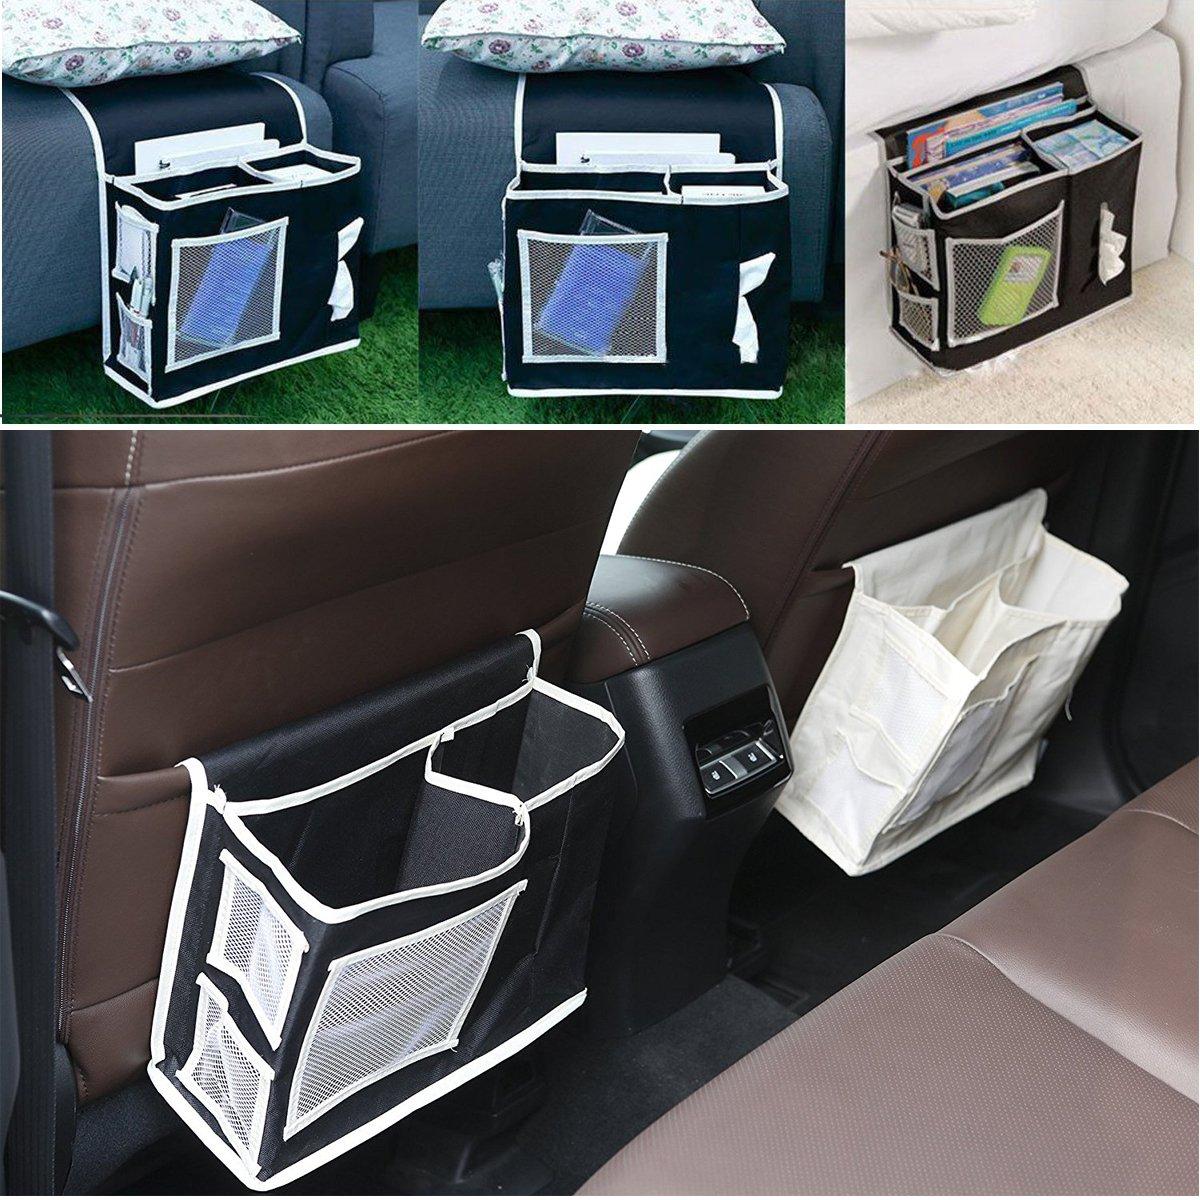 VOIMAKAS Bedside Hanging Storage Bag, 6 Pockets Oxford Cloth Organizer Bag for Book Magazine Phone Tissue TV Remote Accessory - Black by VOIMAKAS (Image #3)